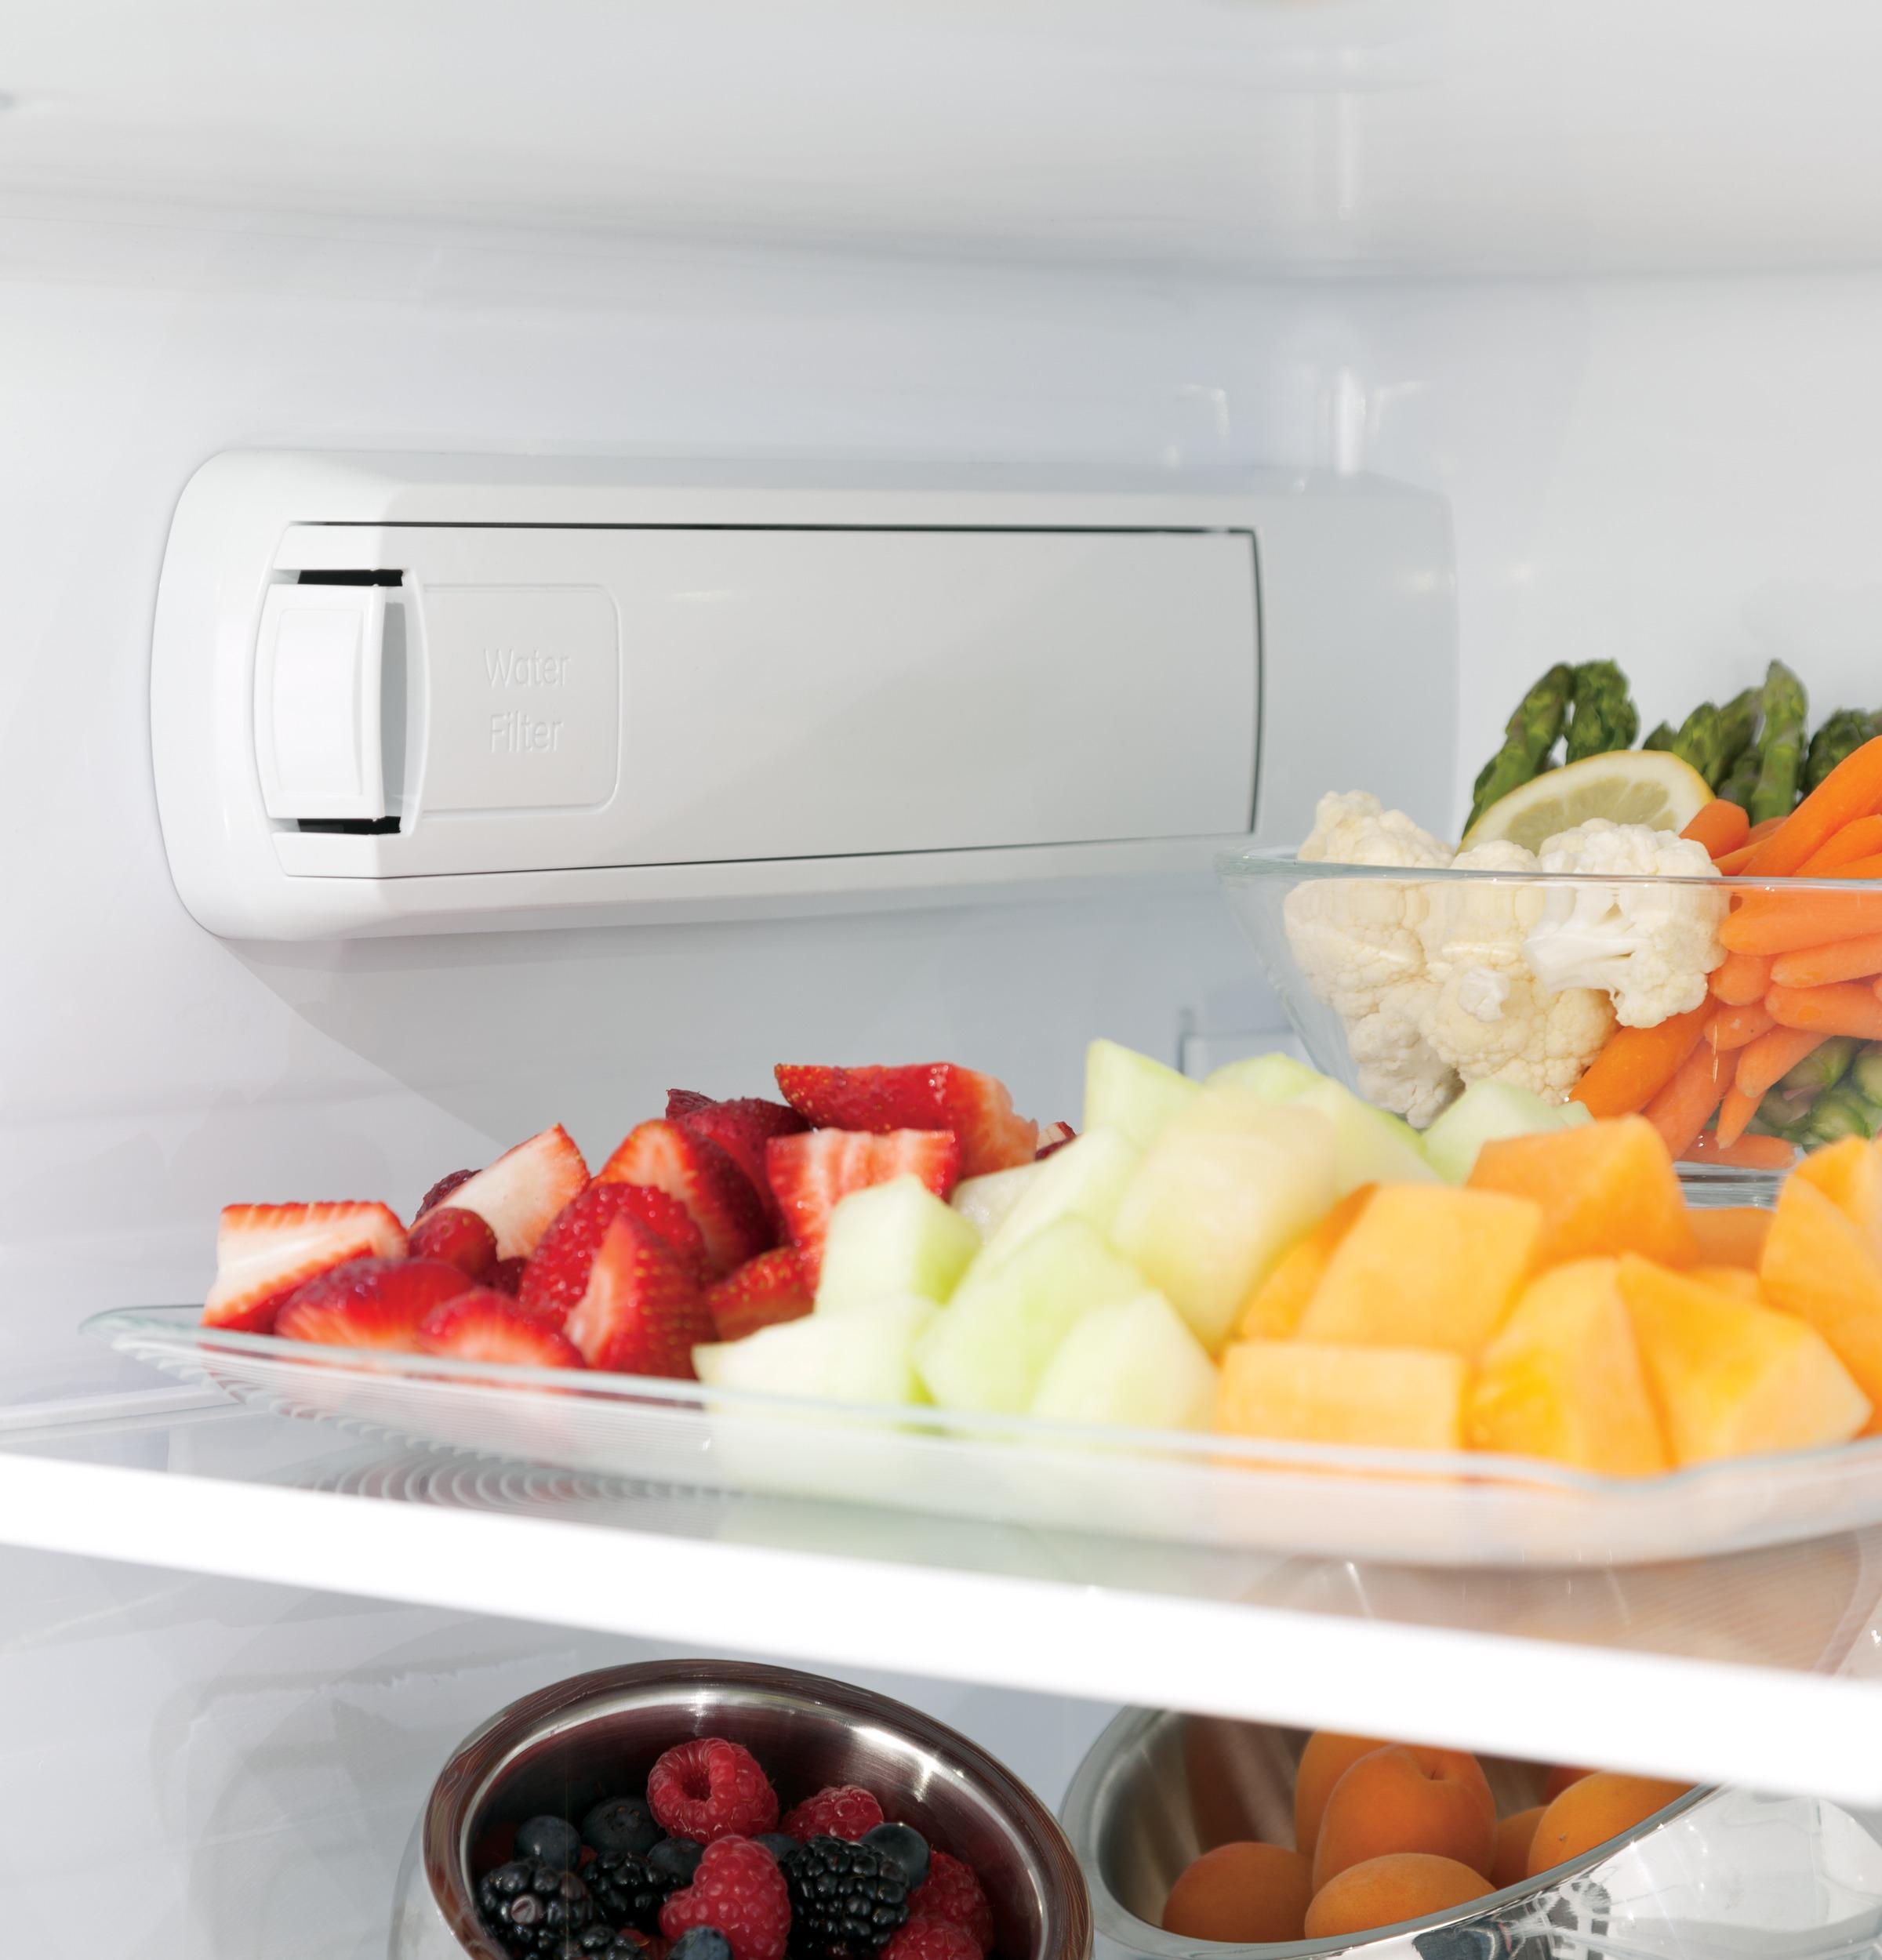 Model: GYE22HMKES | GE® ENERGY STAR® 22.2 Cu. Ft. Counter-Depth French-Door Refrigerator